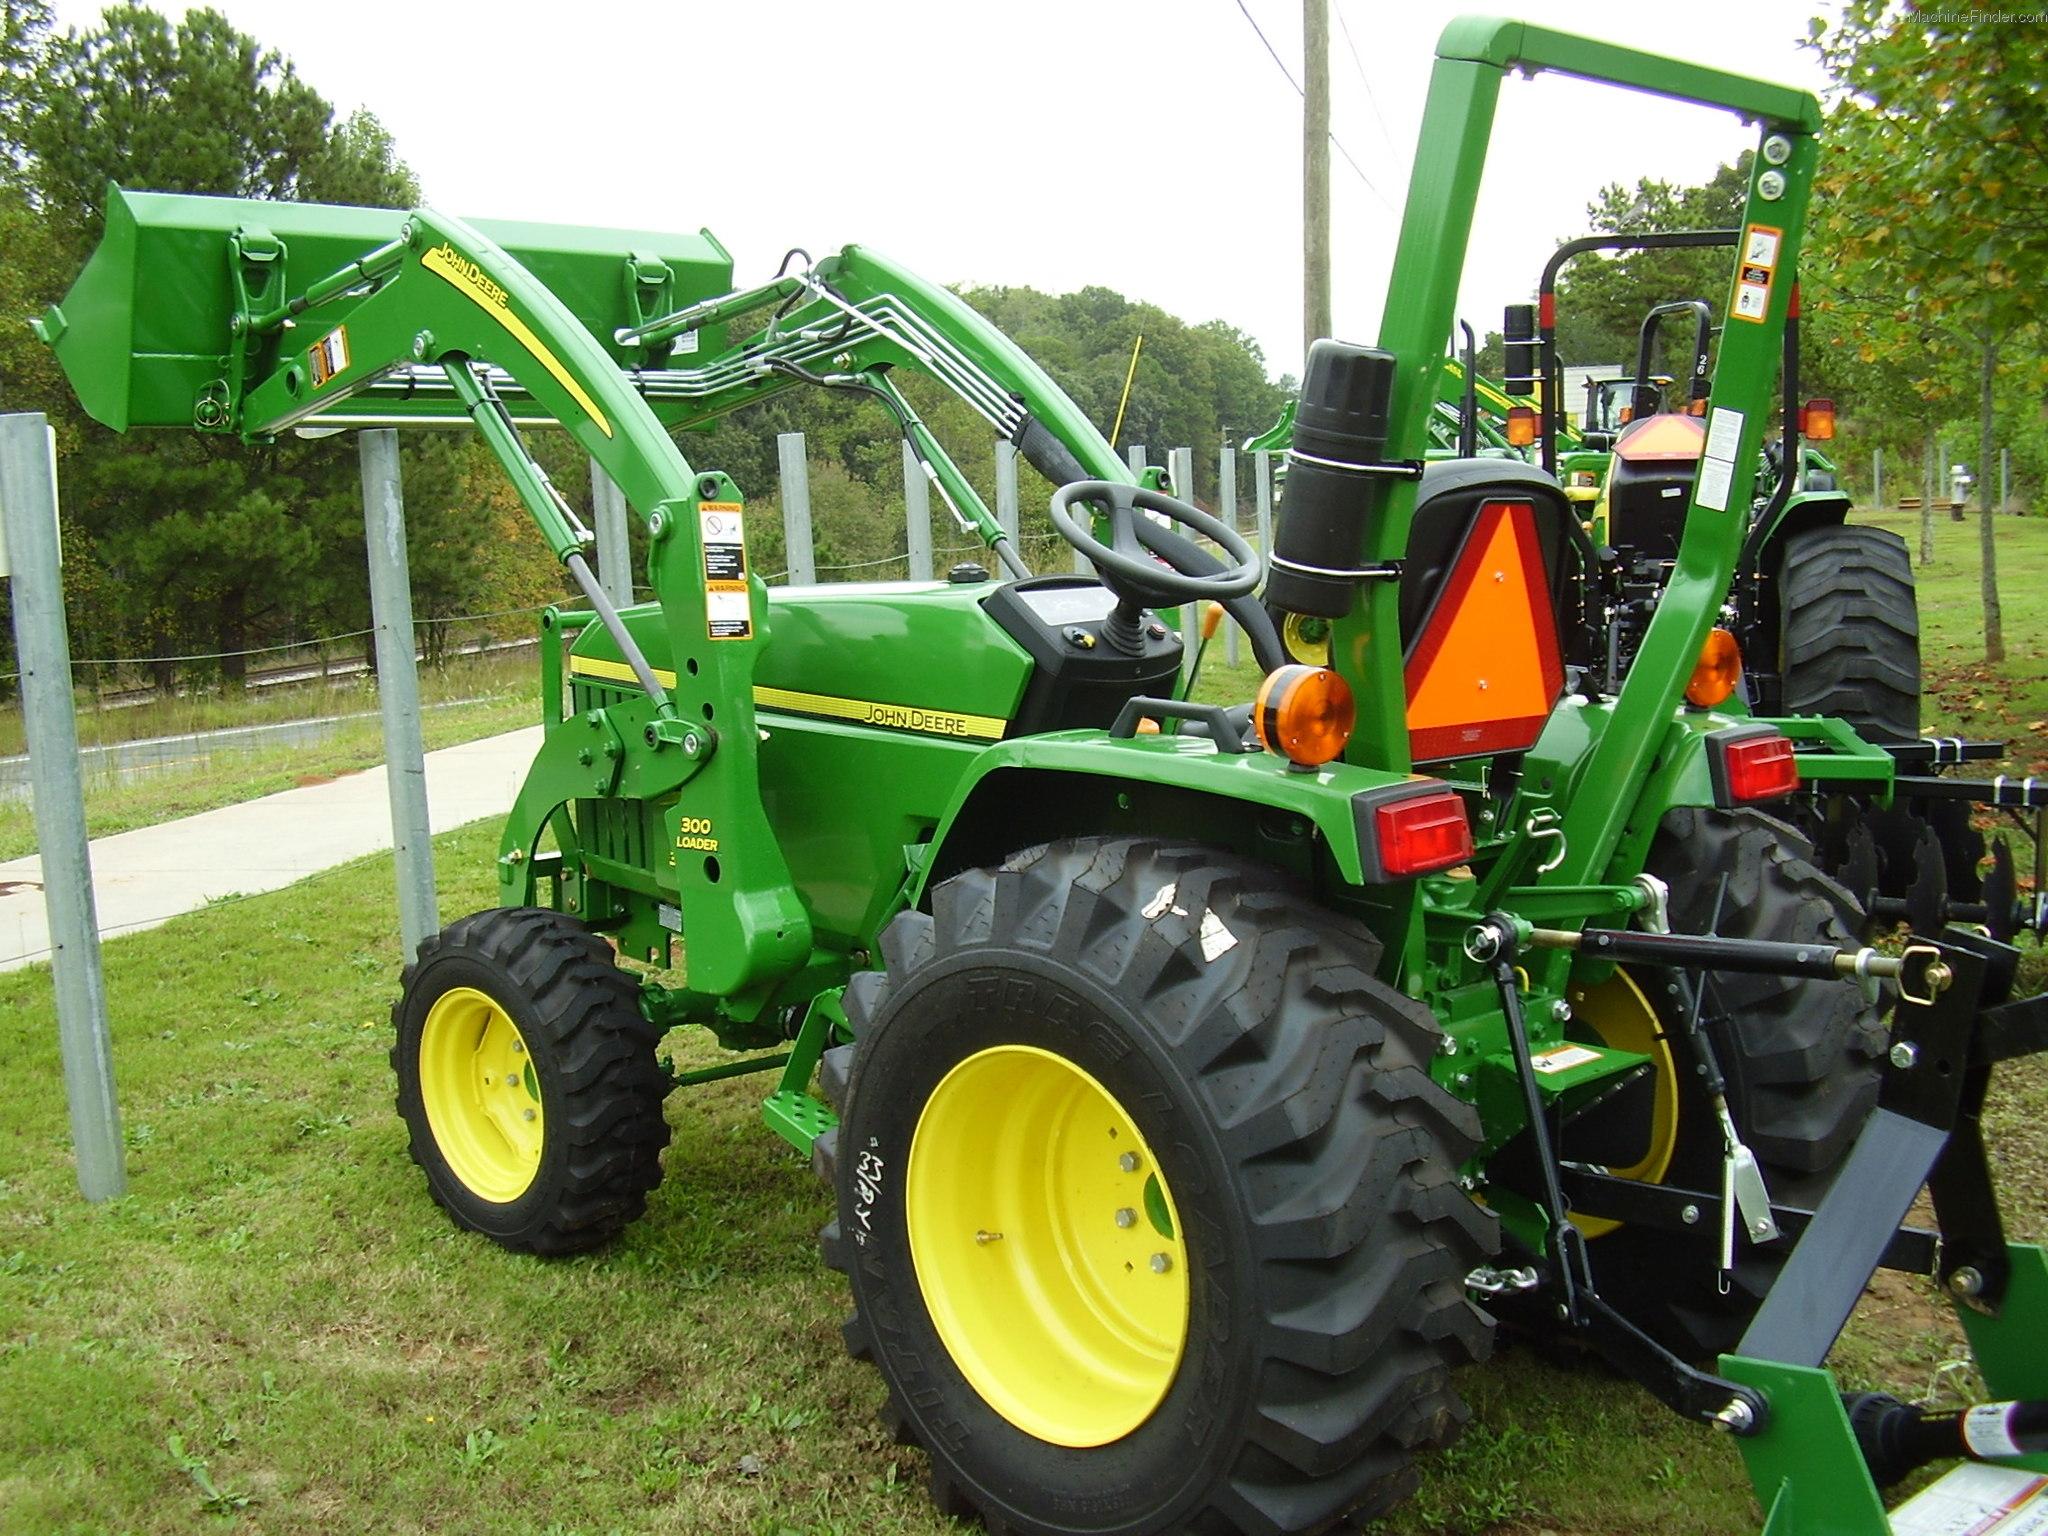 2012 John Deere 3005 Tractors - Compact (1-40hp.) - John ...